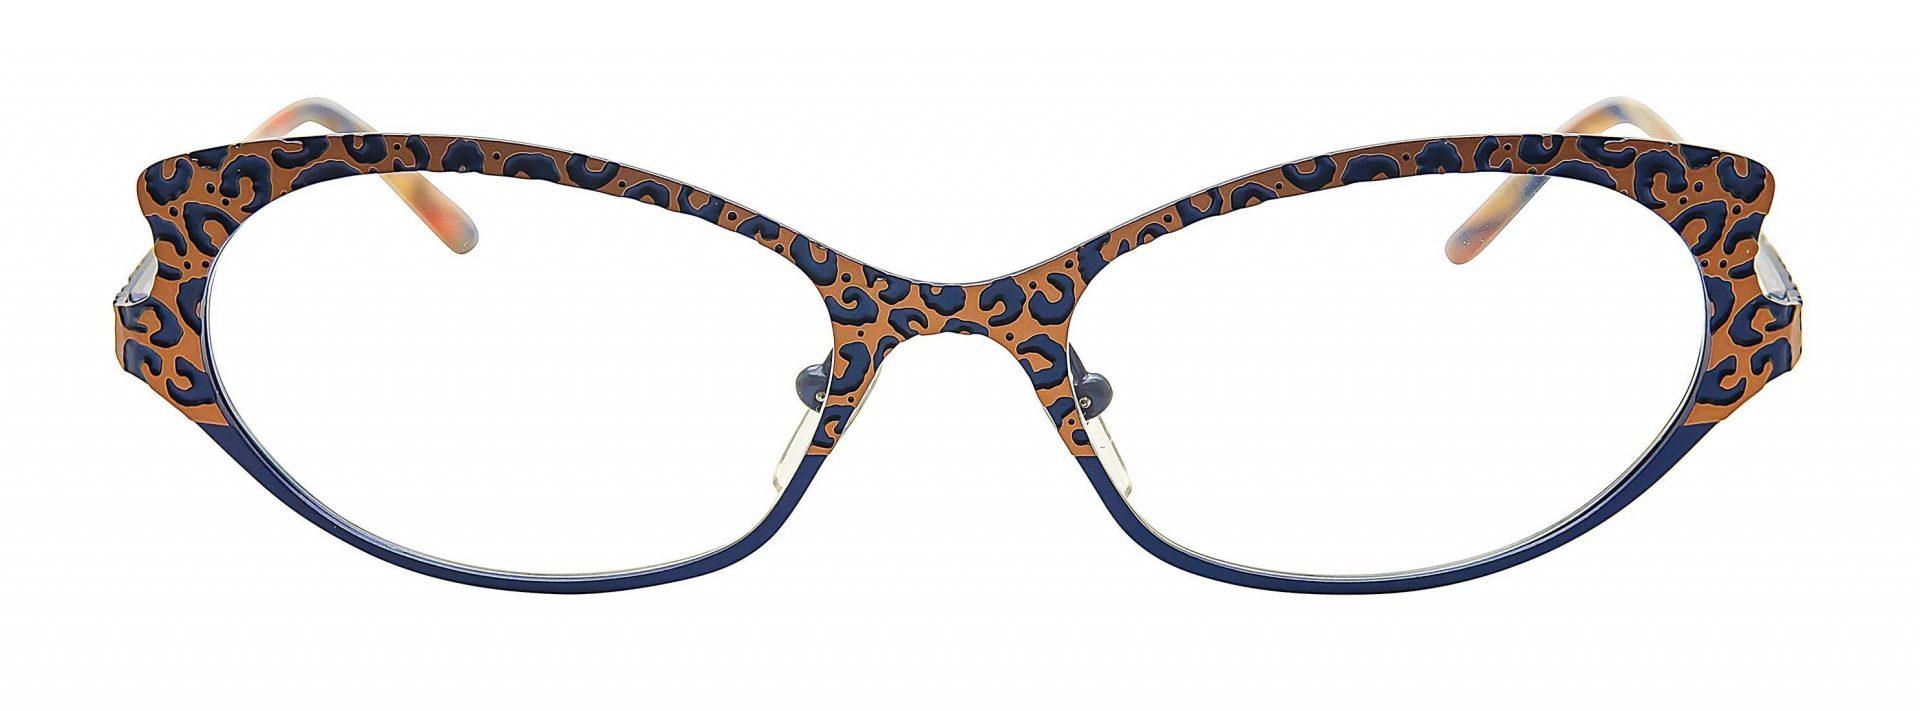 Lafont Glasses Delaunay 355 02 2970x1100